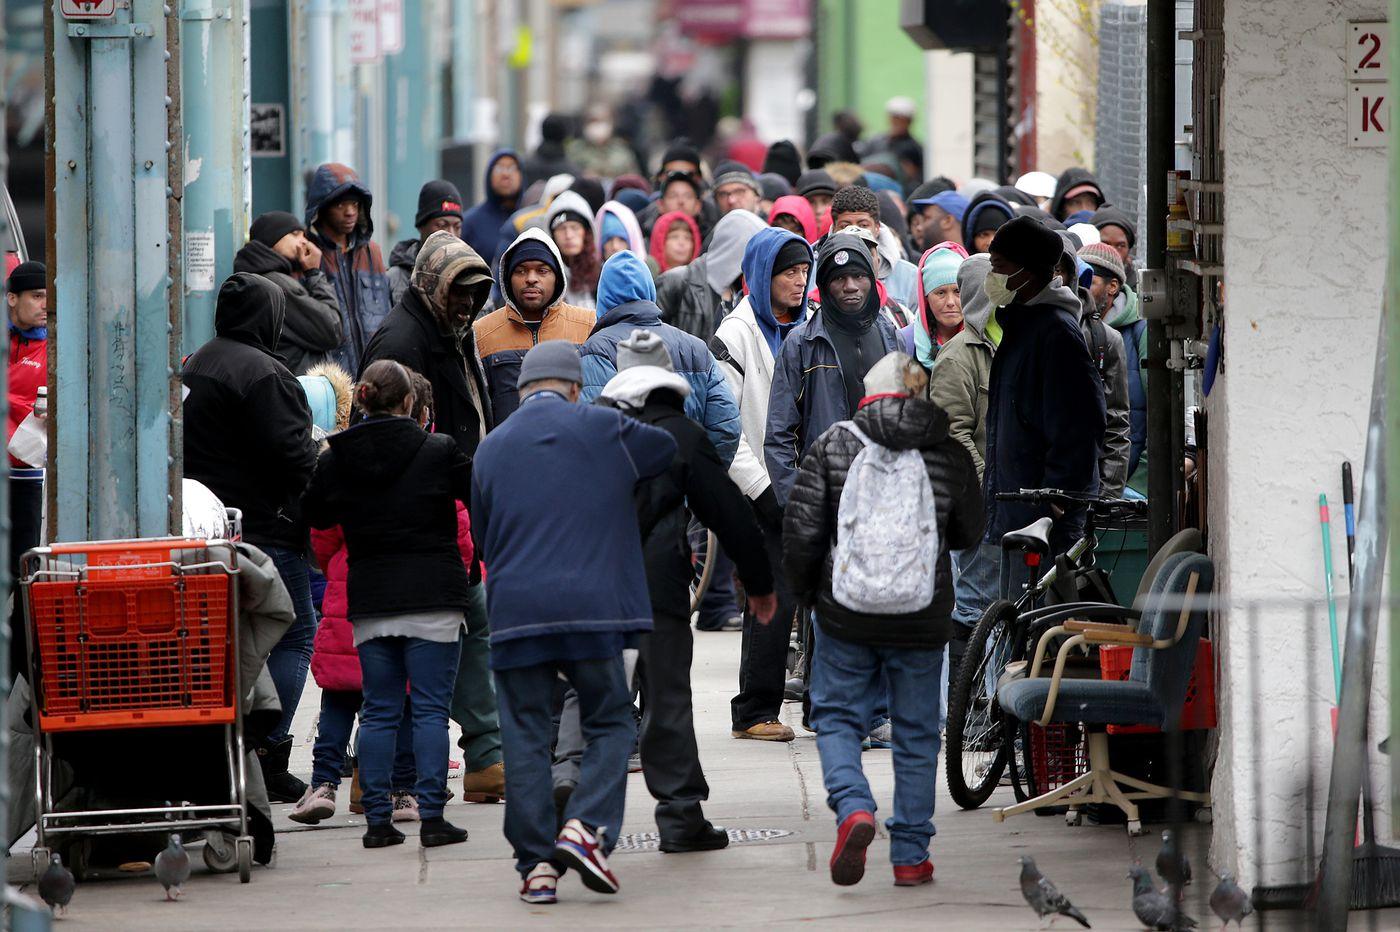 As the coronavirus spreads, staving off hunger is a challenge in Kensington, Philadelphia's poorest neighborhood